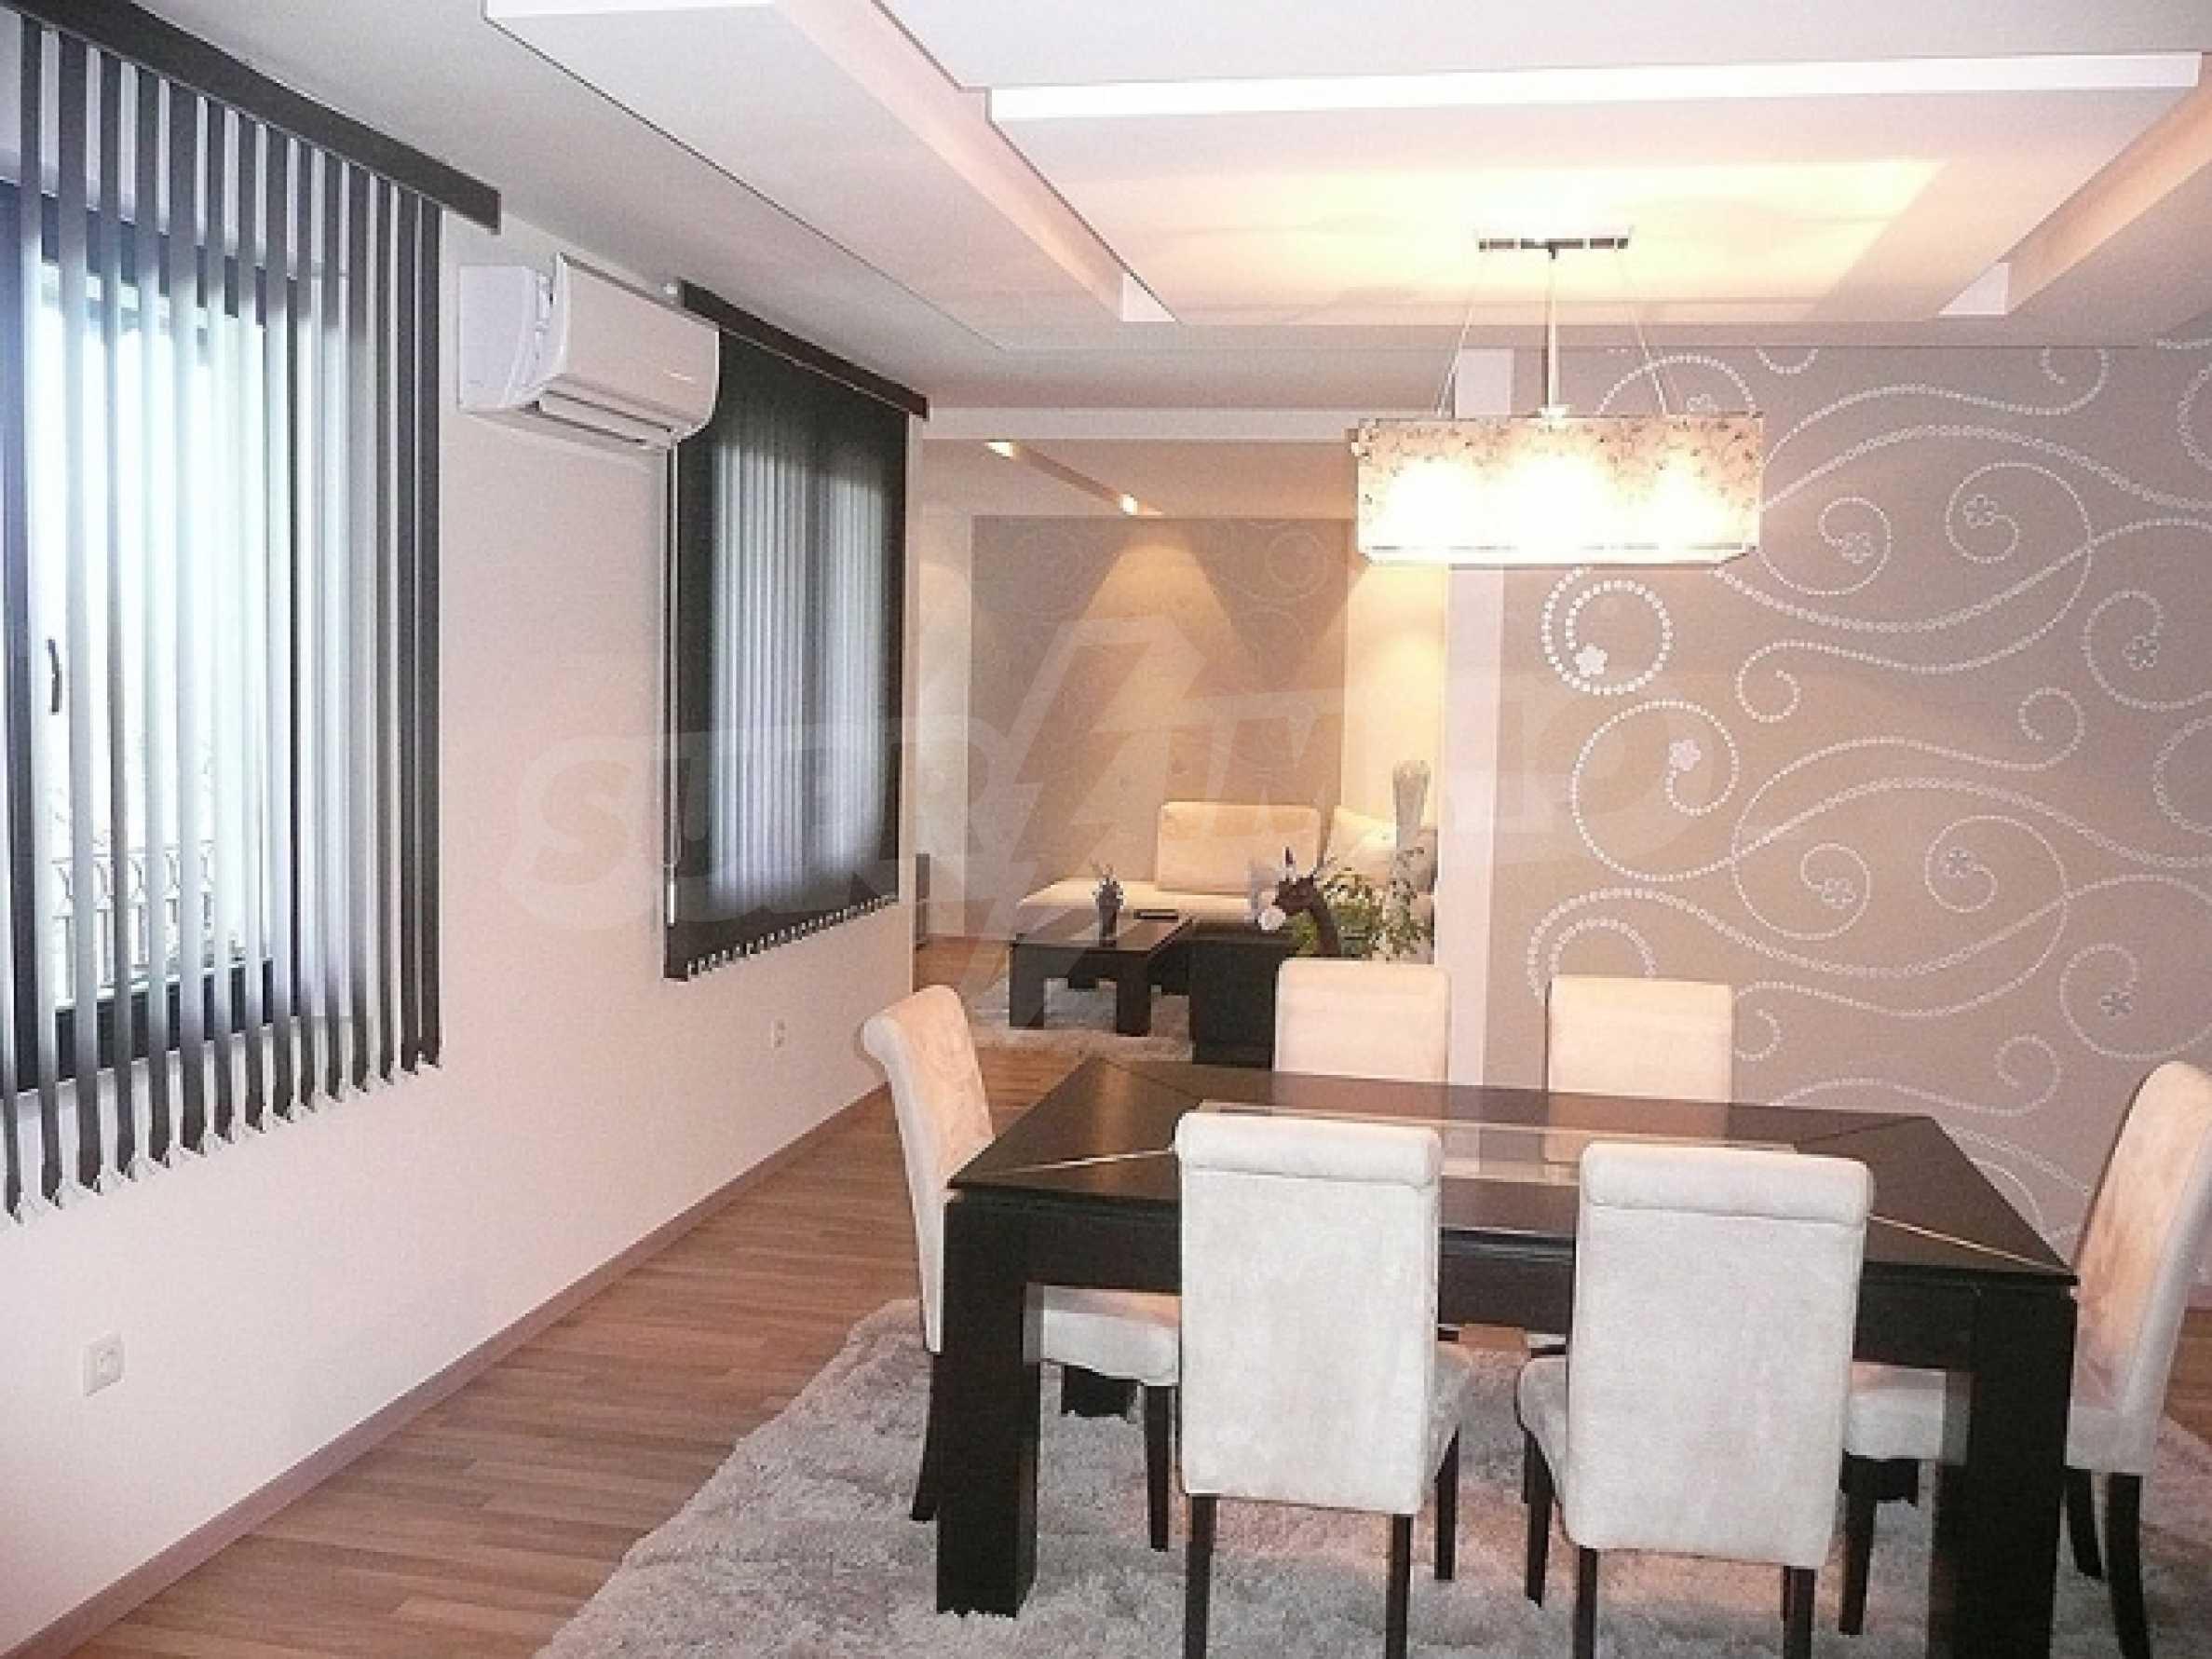 Wohnung in Priselski Klöstern 4